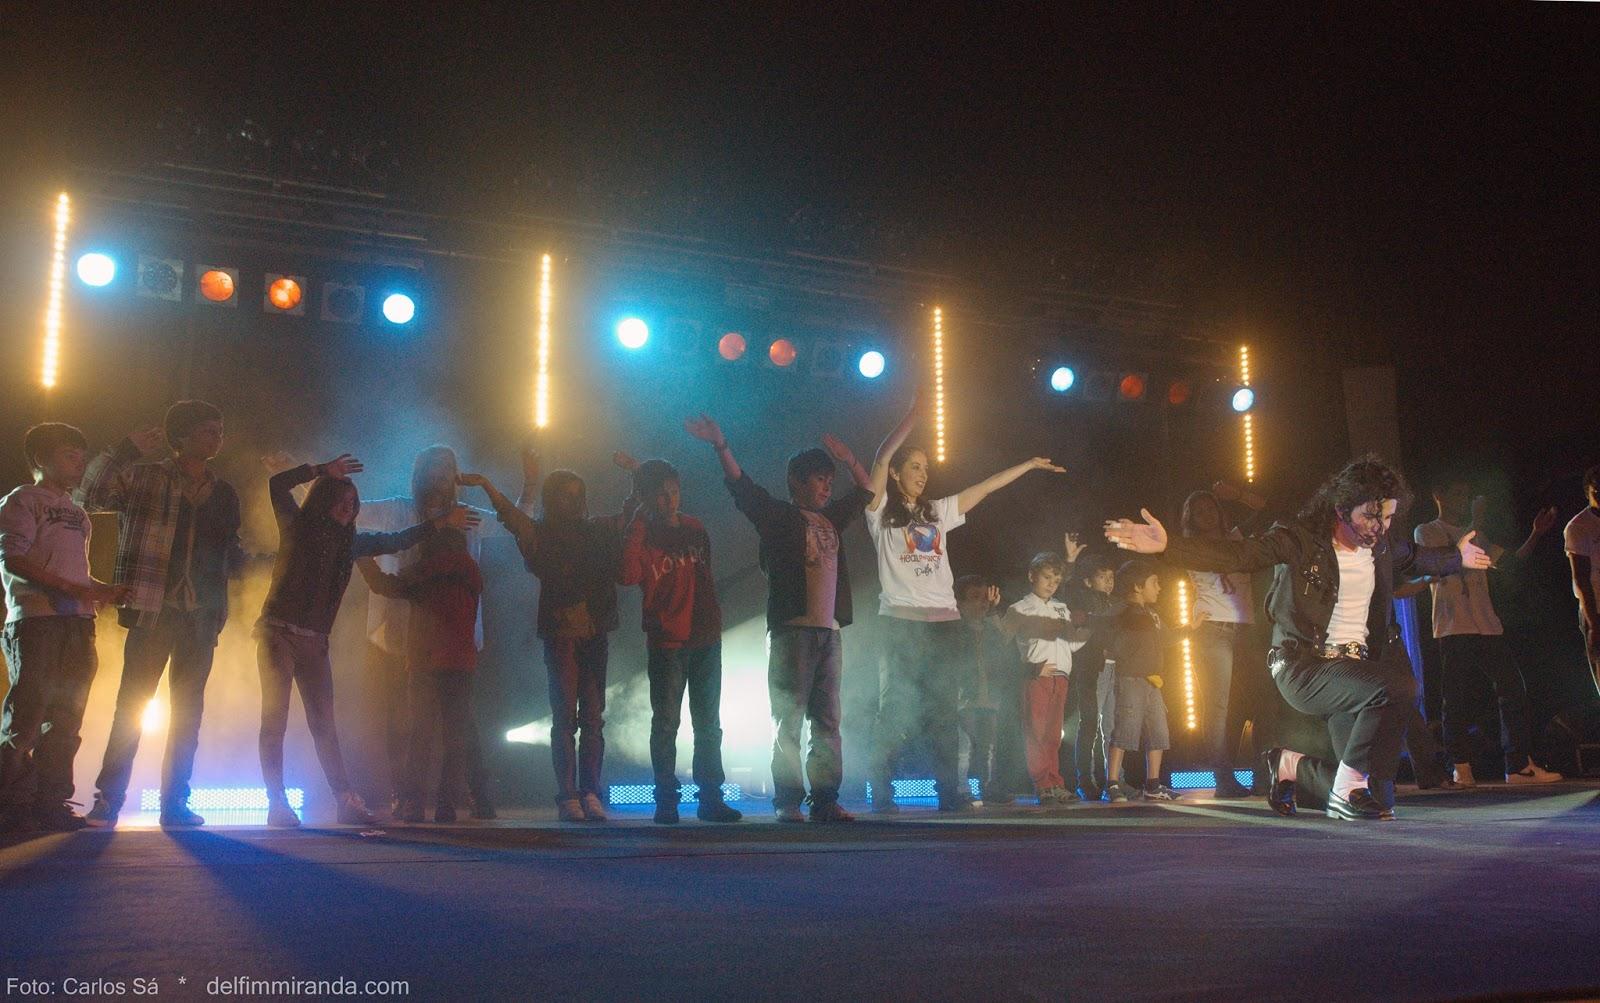 Delfim Miranda - Michael Jackson Tribute - Heal the World - Final Sequence